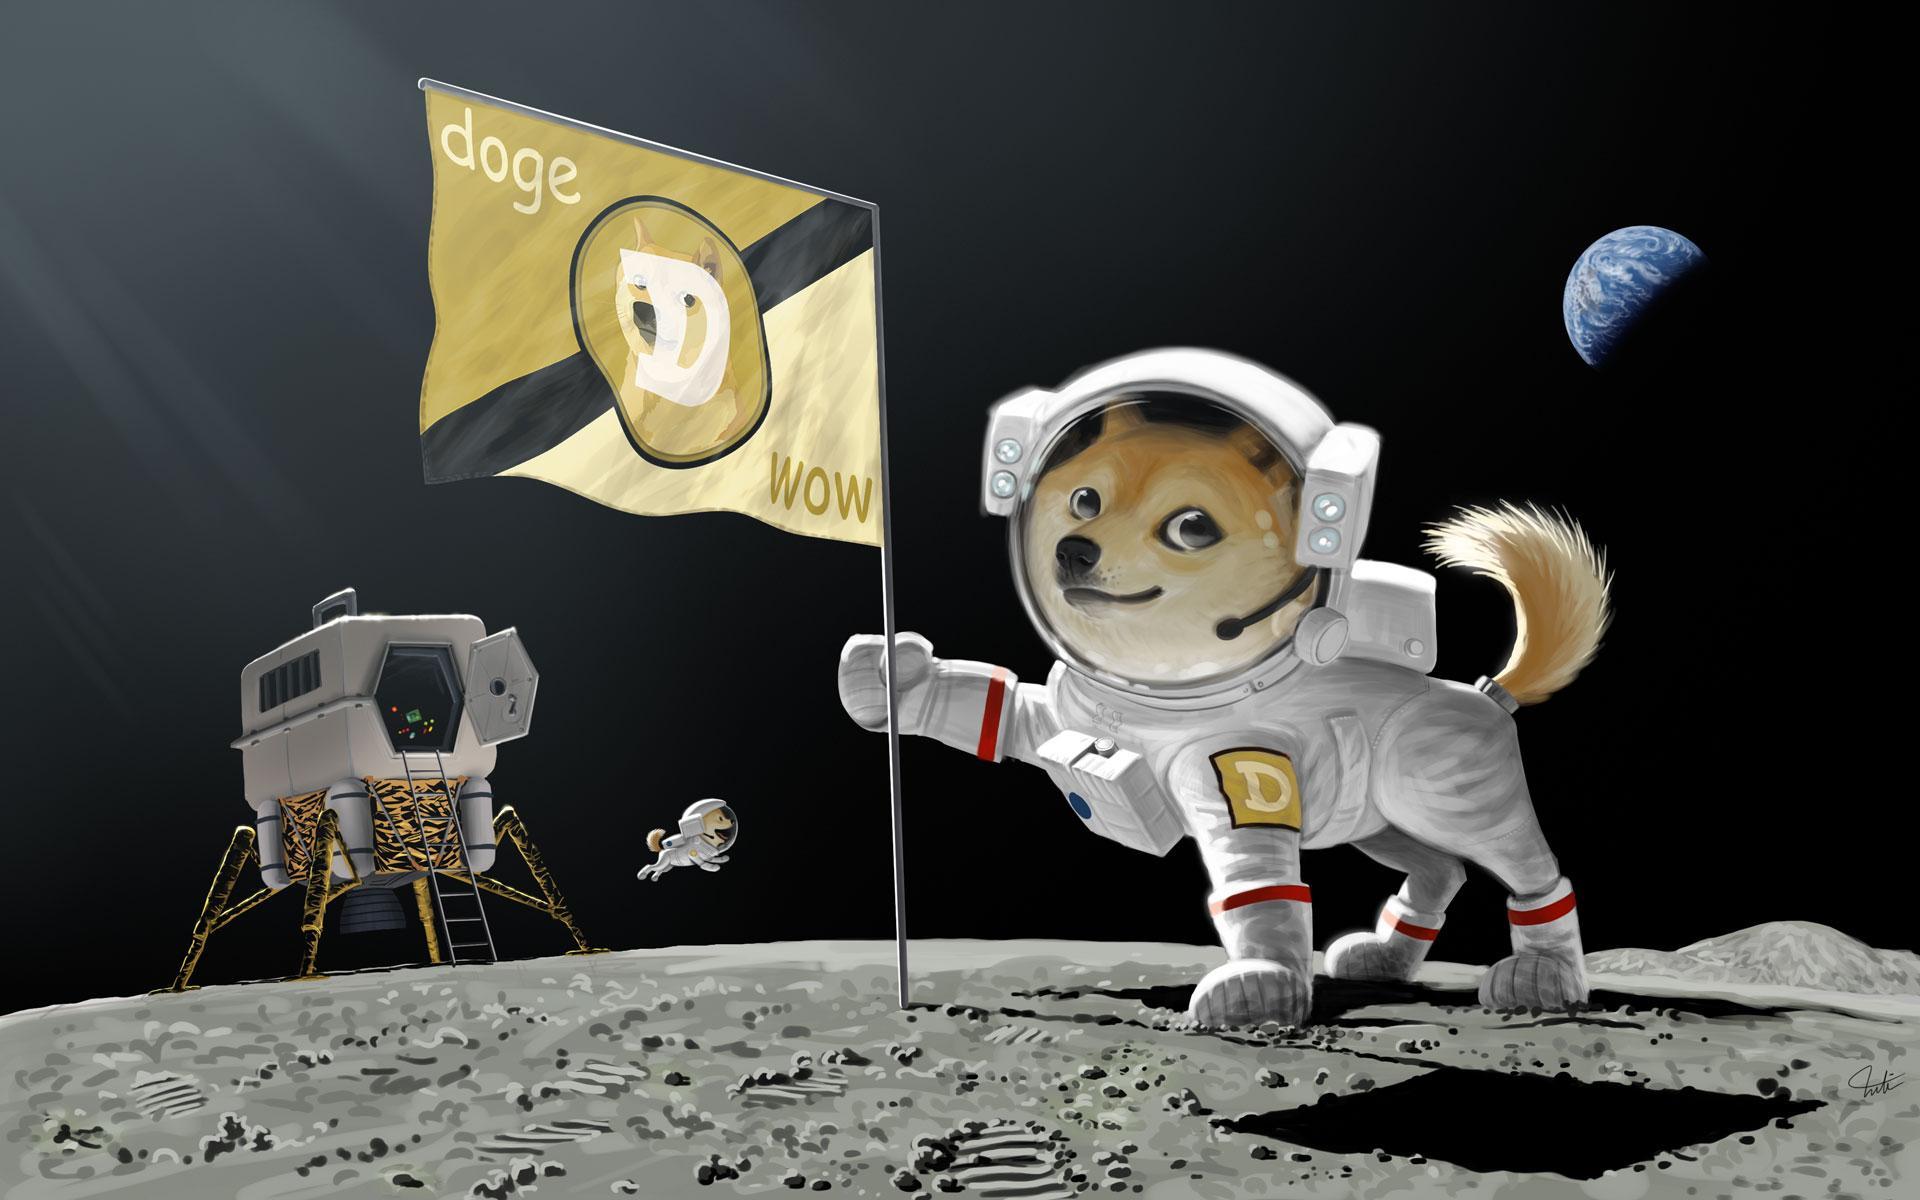 Dogecoin Fiyat Analizi: 19 Ocak